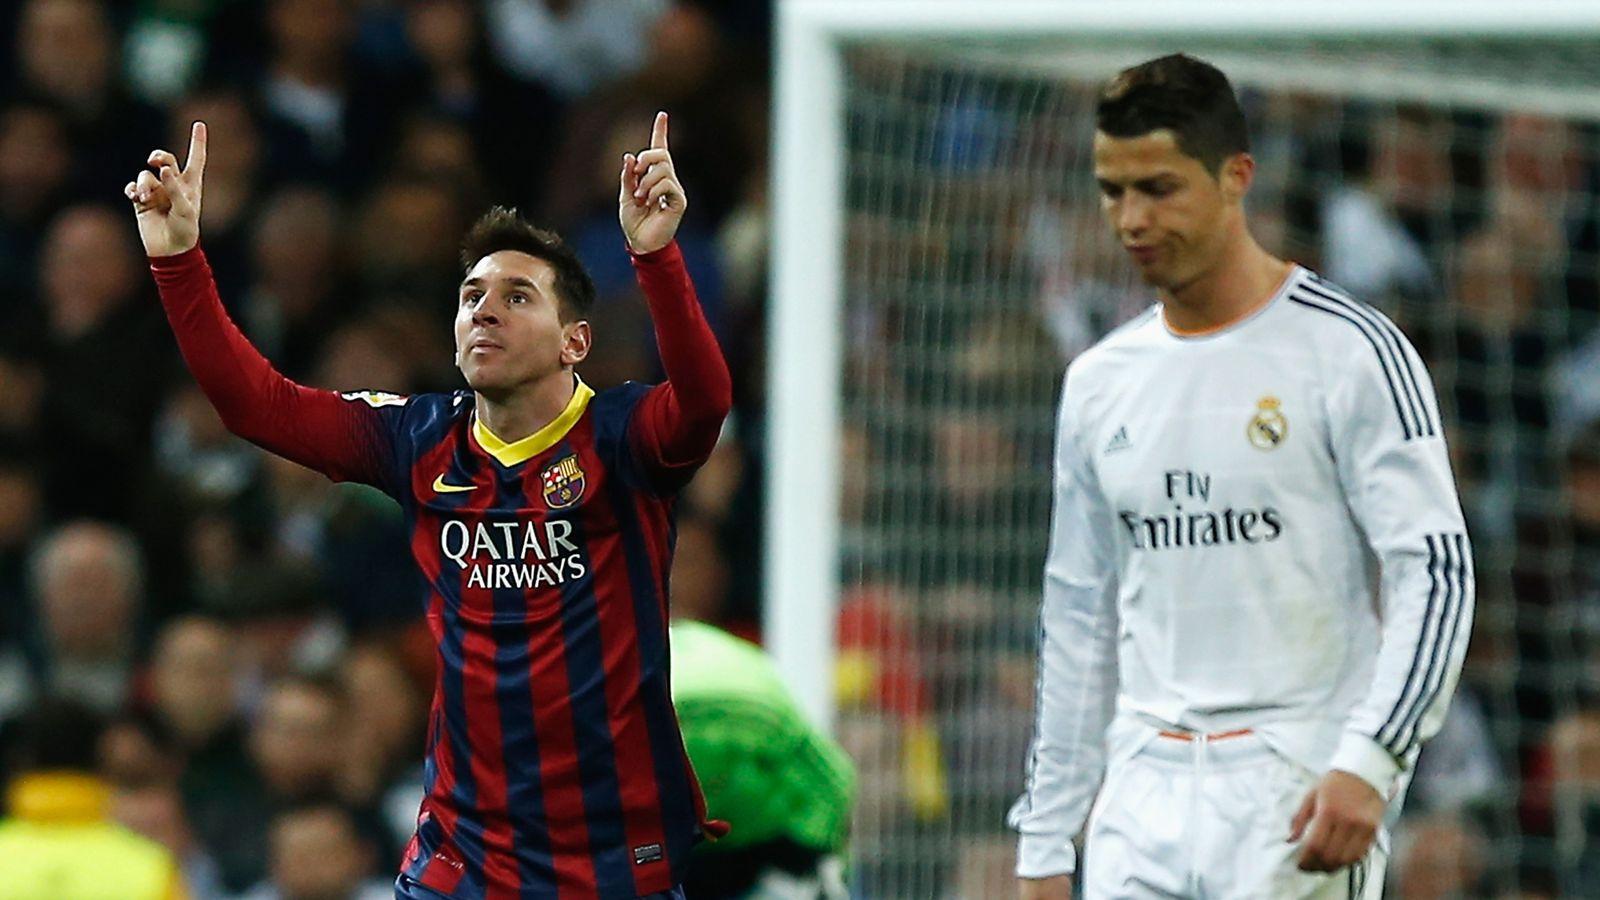 Real Madrid vs. Barcelona, 2014 El Clásico: Final score 3-4, Messi's hat trick revives Barca's ...